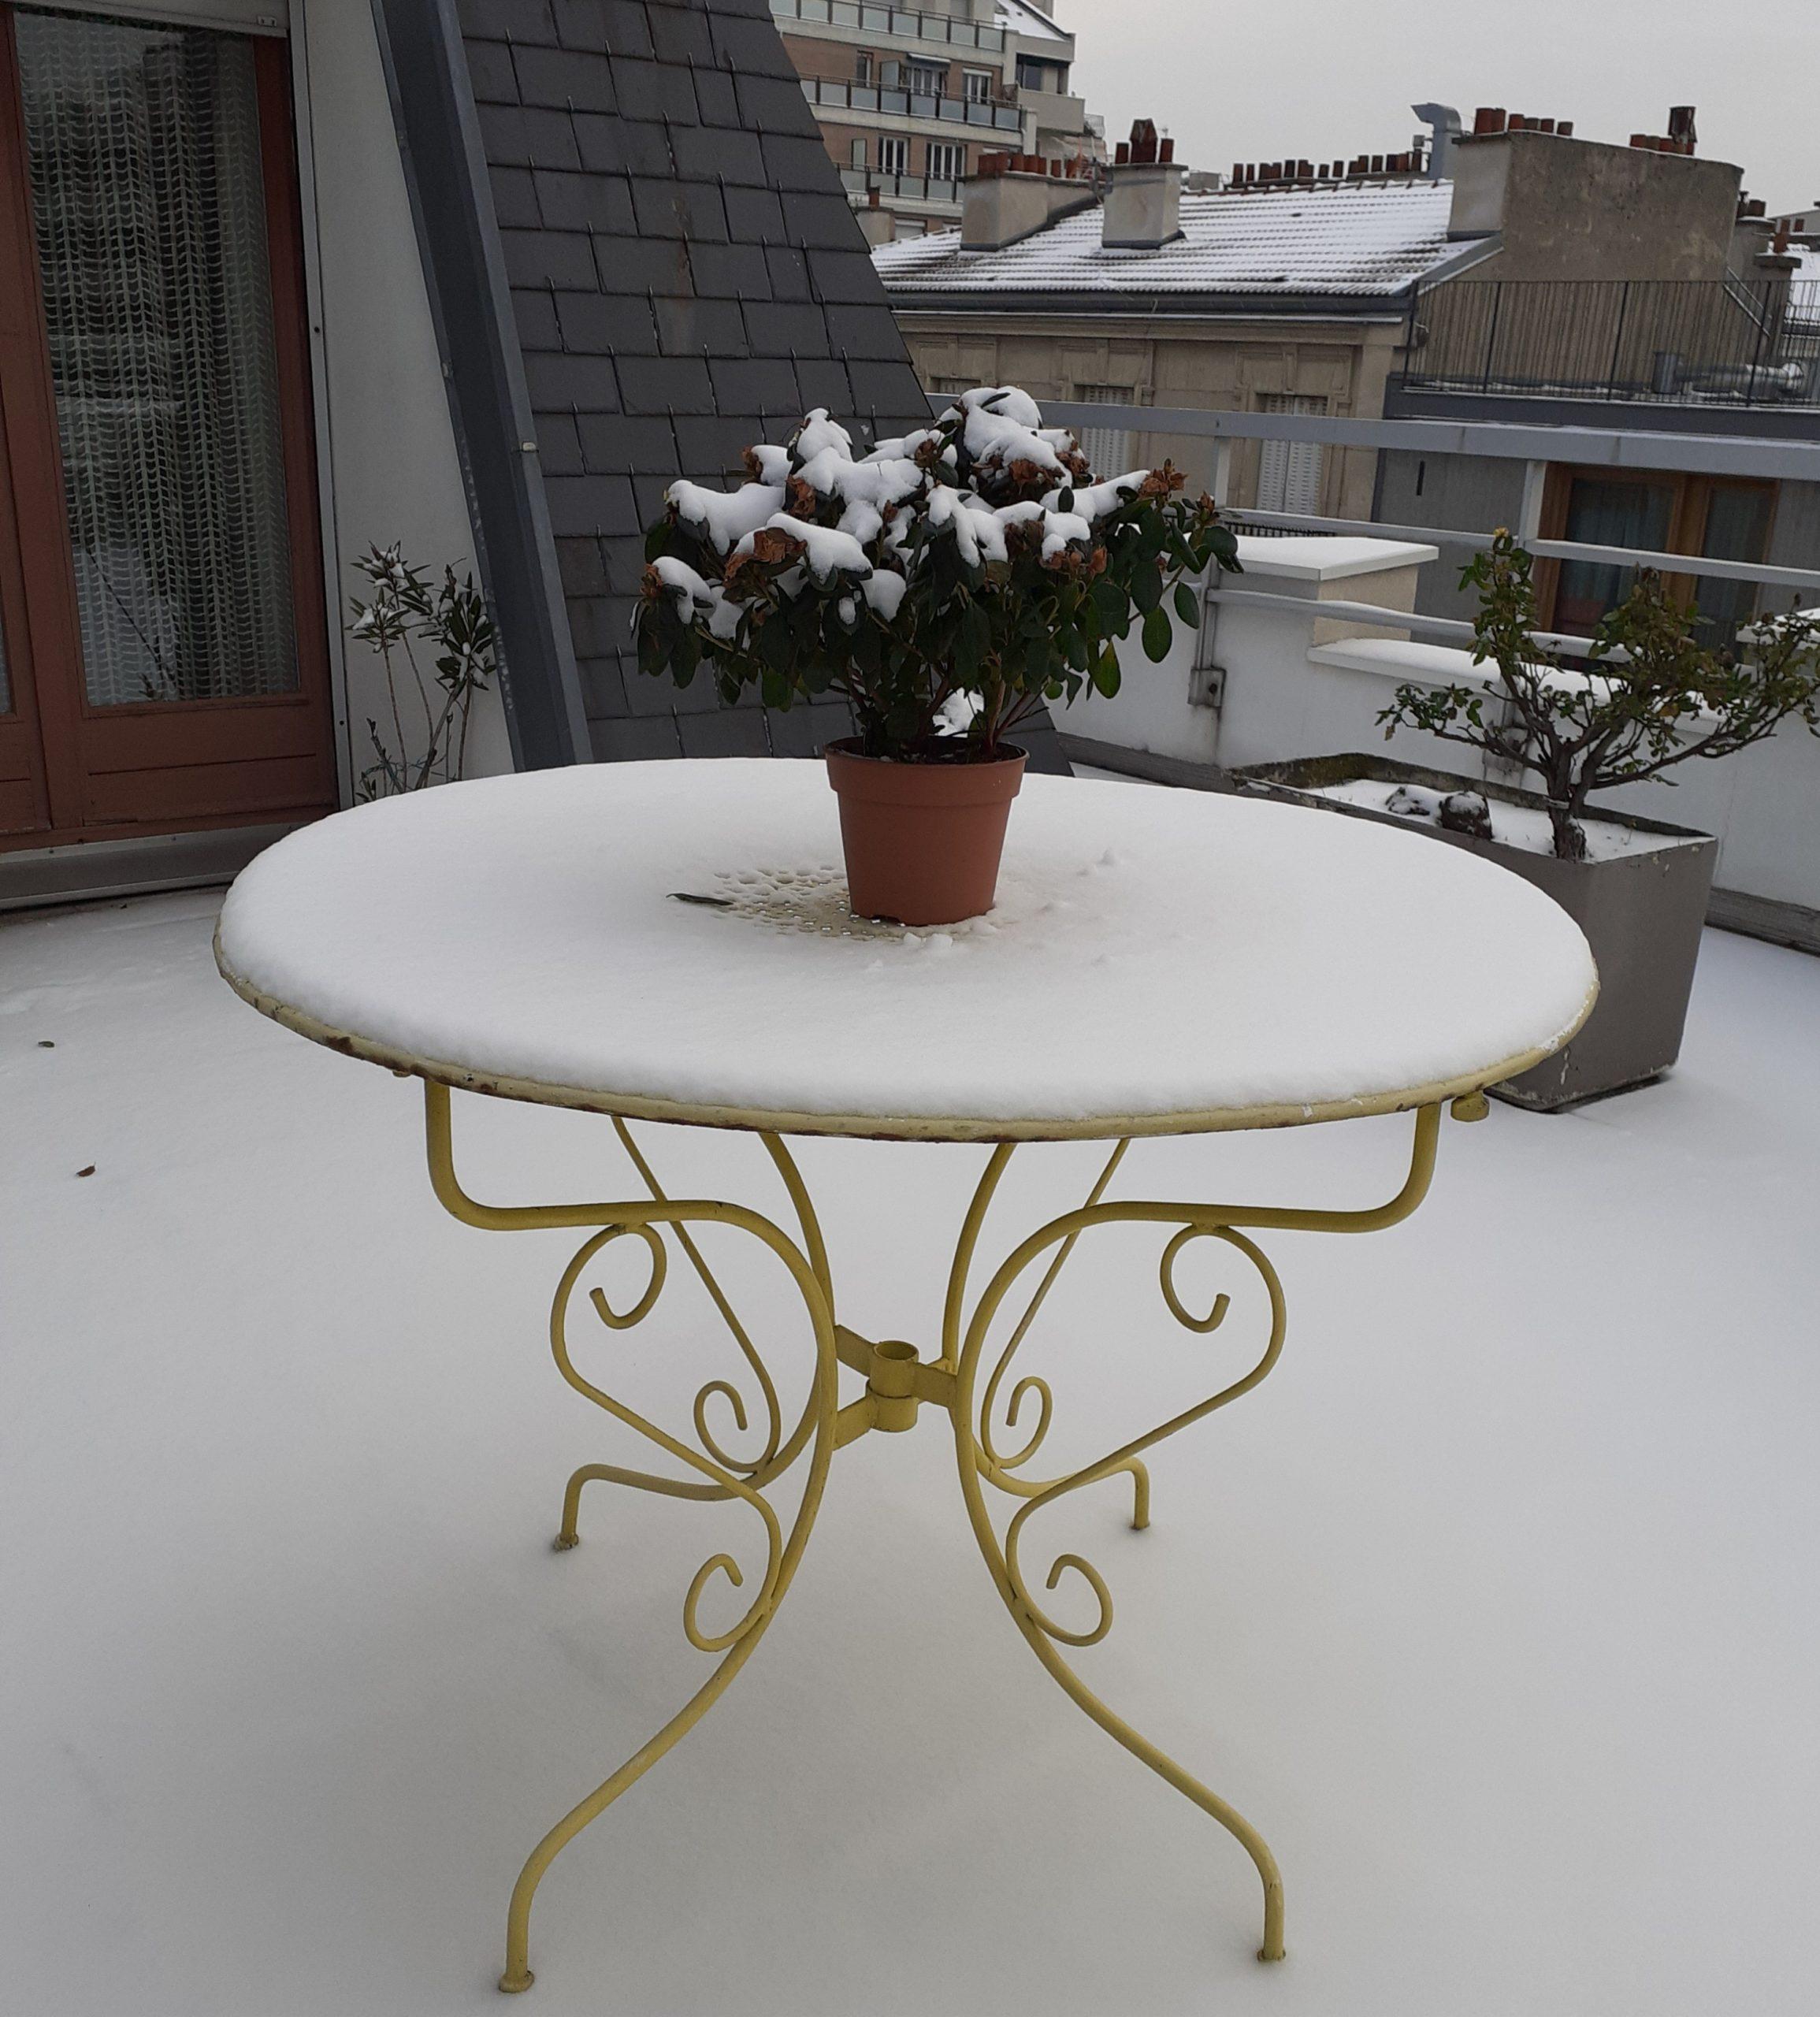 https://ajl-asso.fr/marechal-leclerc/wp-content/uploads/sites/5/2021/02/table-neige-scaled.jpg